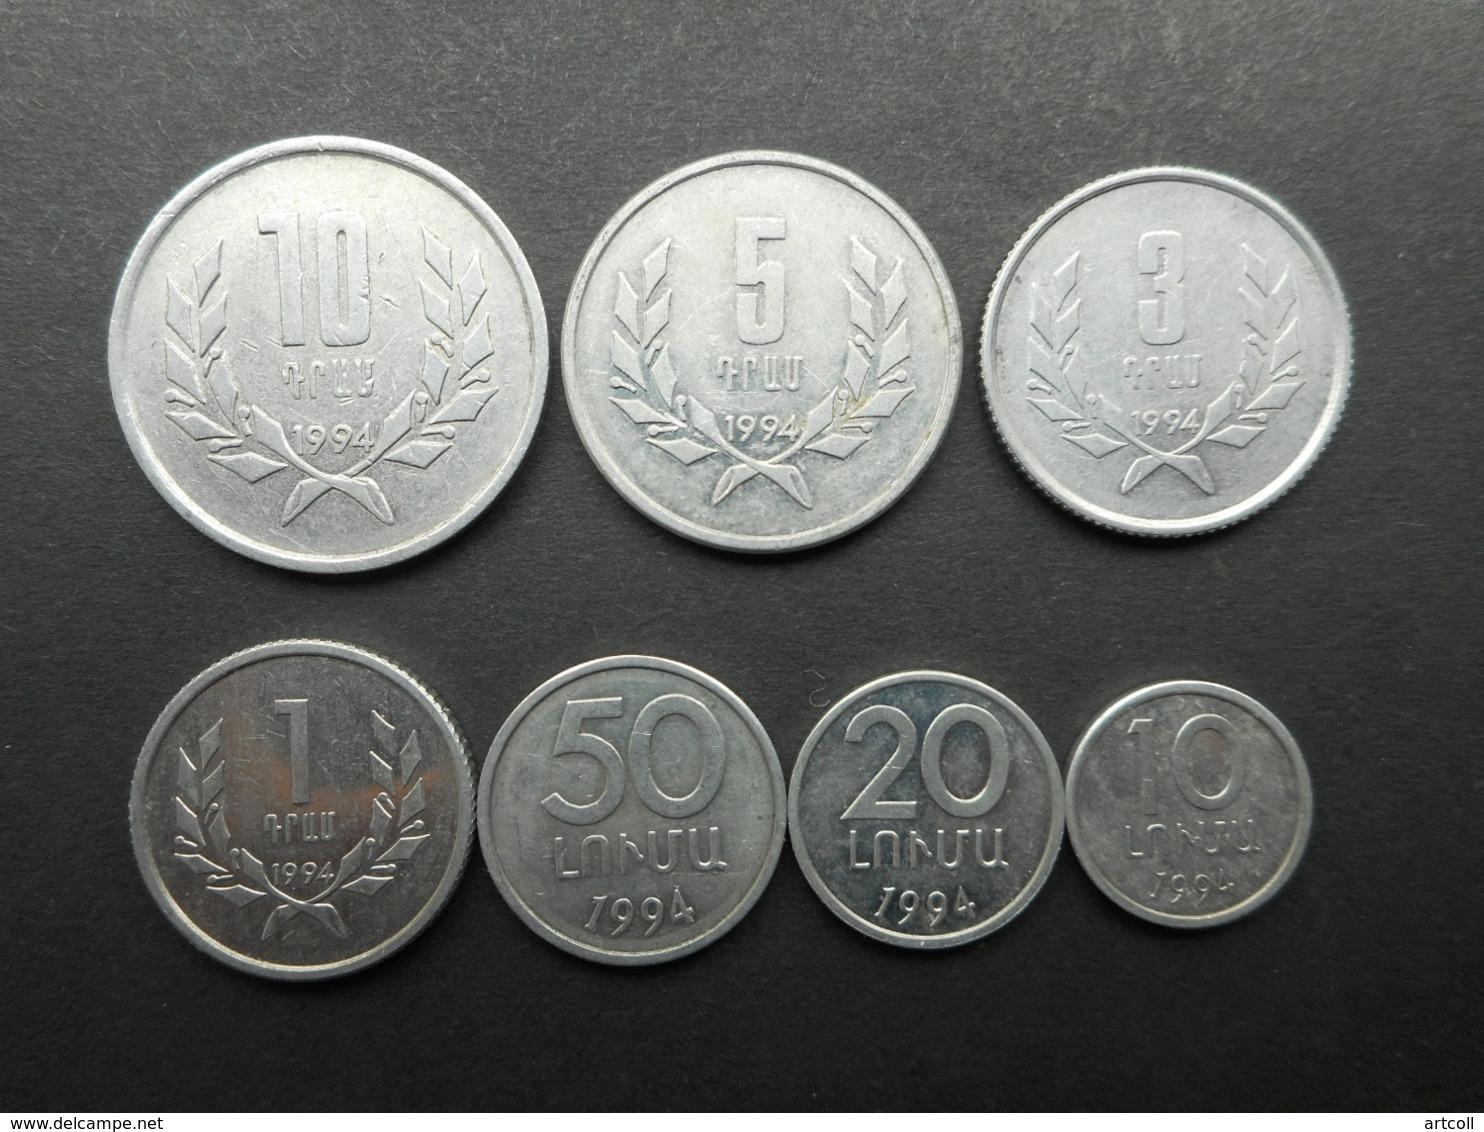 Armenia 10,20,50 Luma,1,3,5,10 Dram 1994 (Lot Of 7 Coins) - Armenia